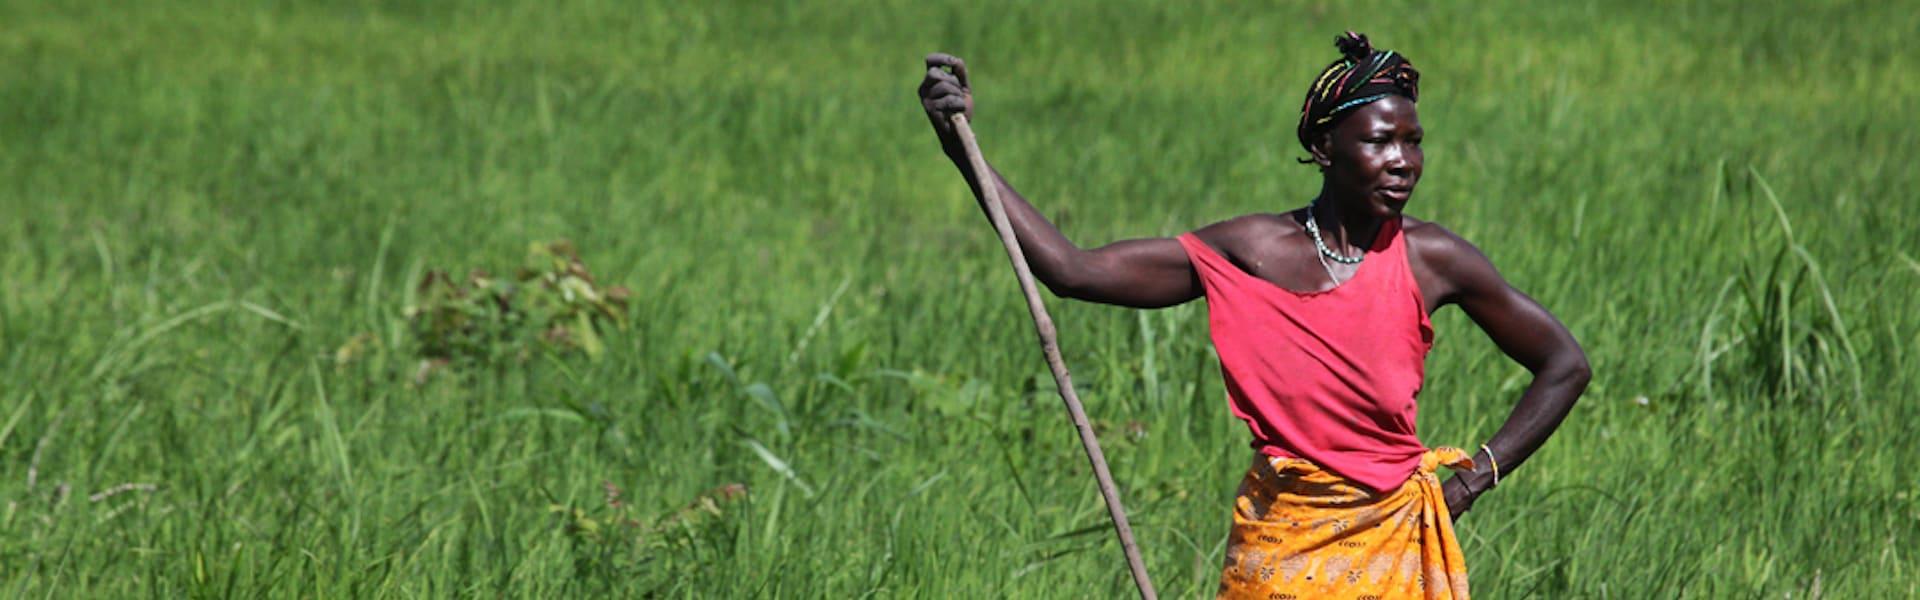 Woman, Africa, agriculture, entrepreneurship, NextBillion.net